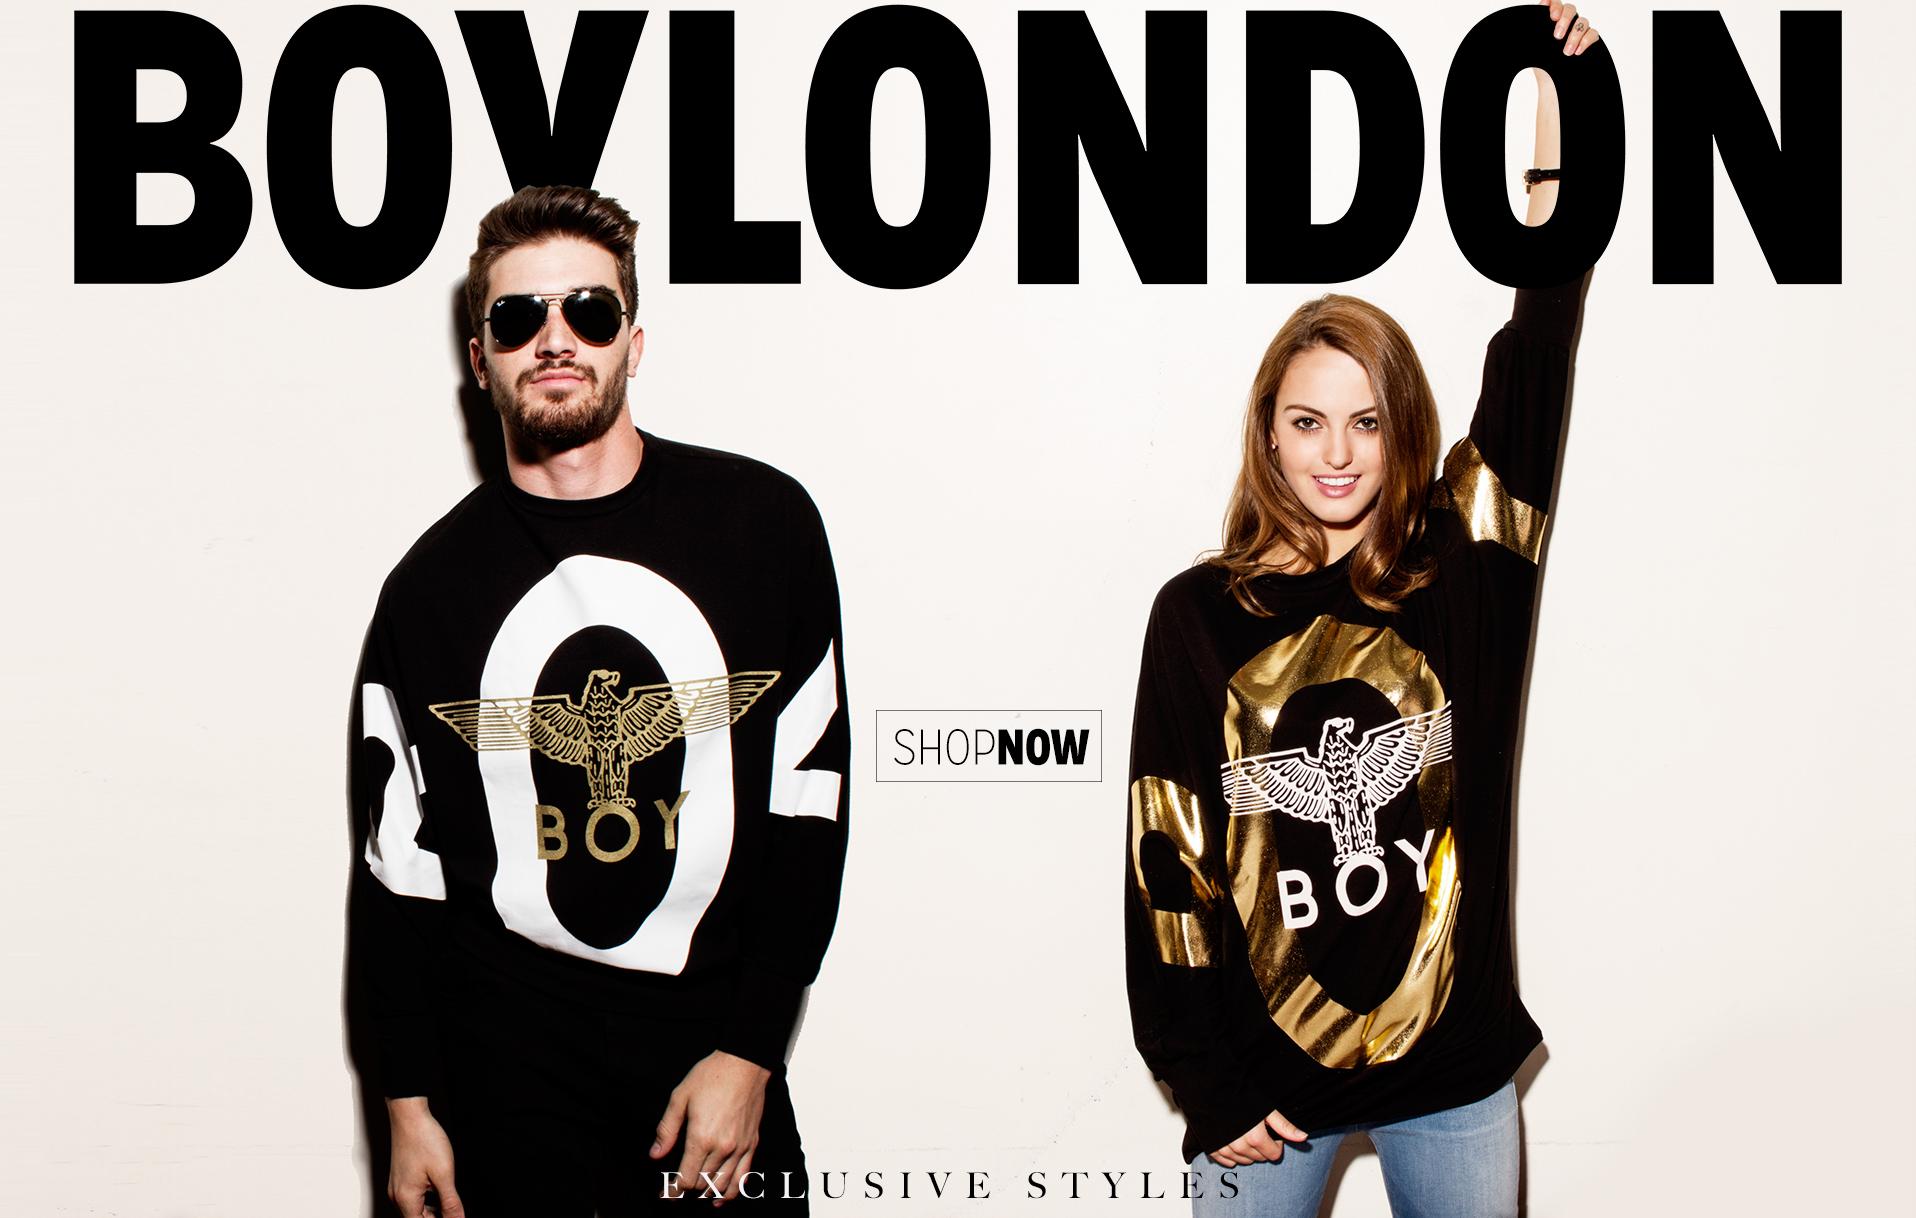 boylondon_banner.jpg